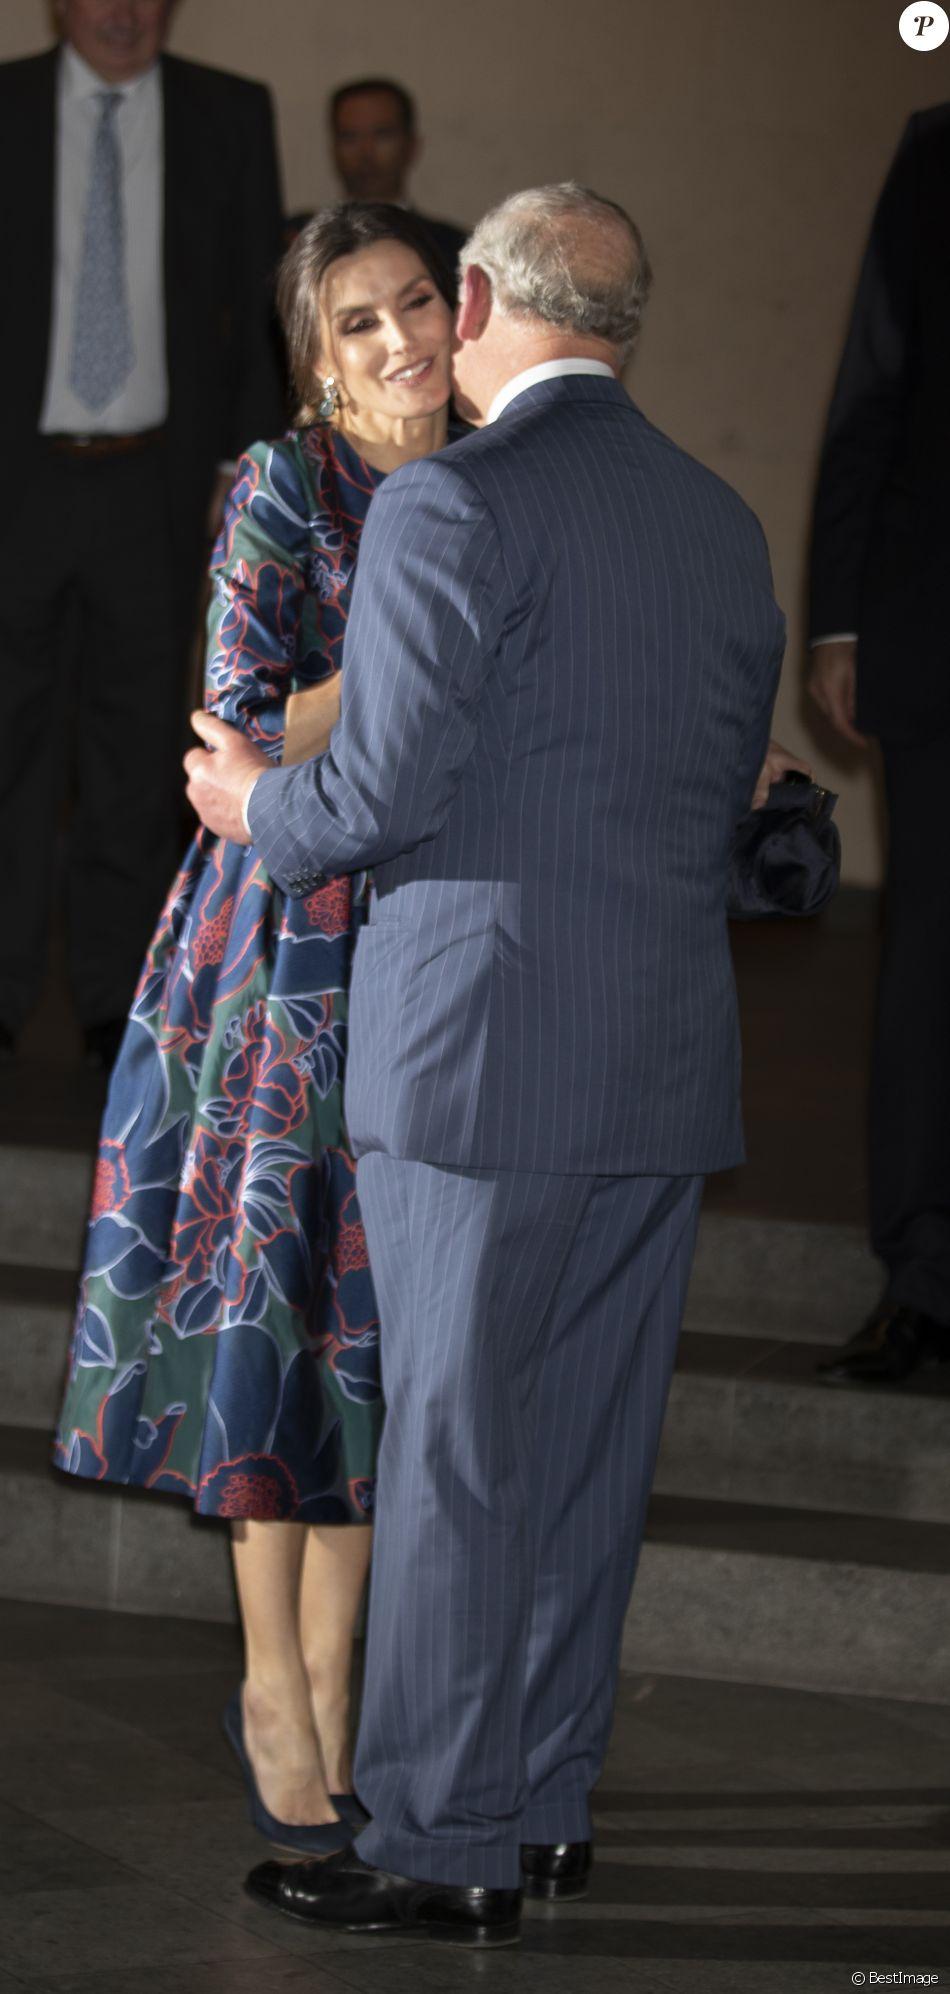 "La reine Letizia d'Espagne (robe Carolina Herrera) inaugurait le 13 mars 2019 avec le prince Charles l'exposition ""Sorolla: Spanish Master of Light"" à la National Gallery à Londres."